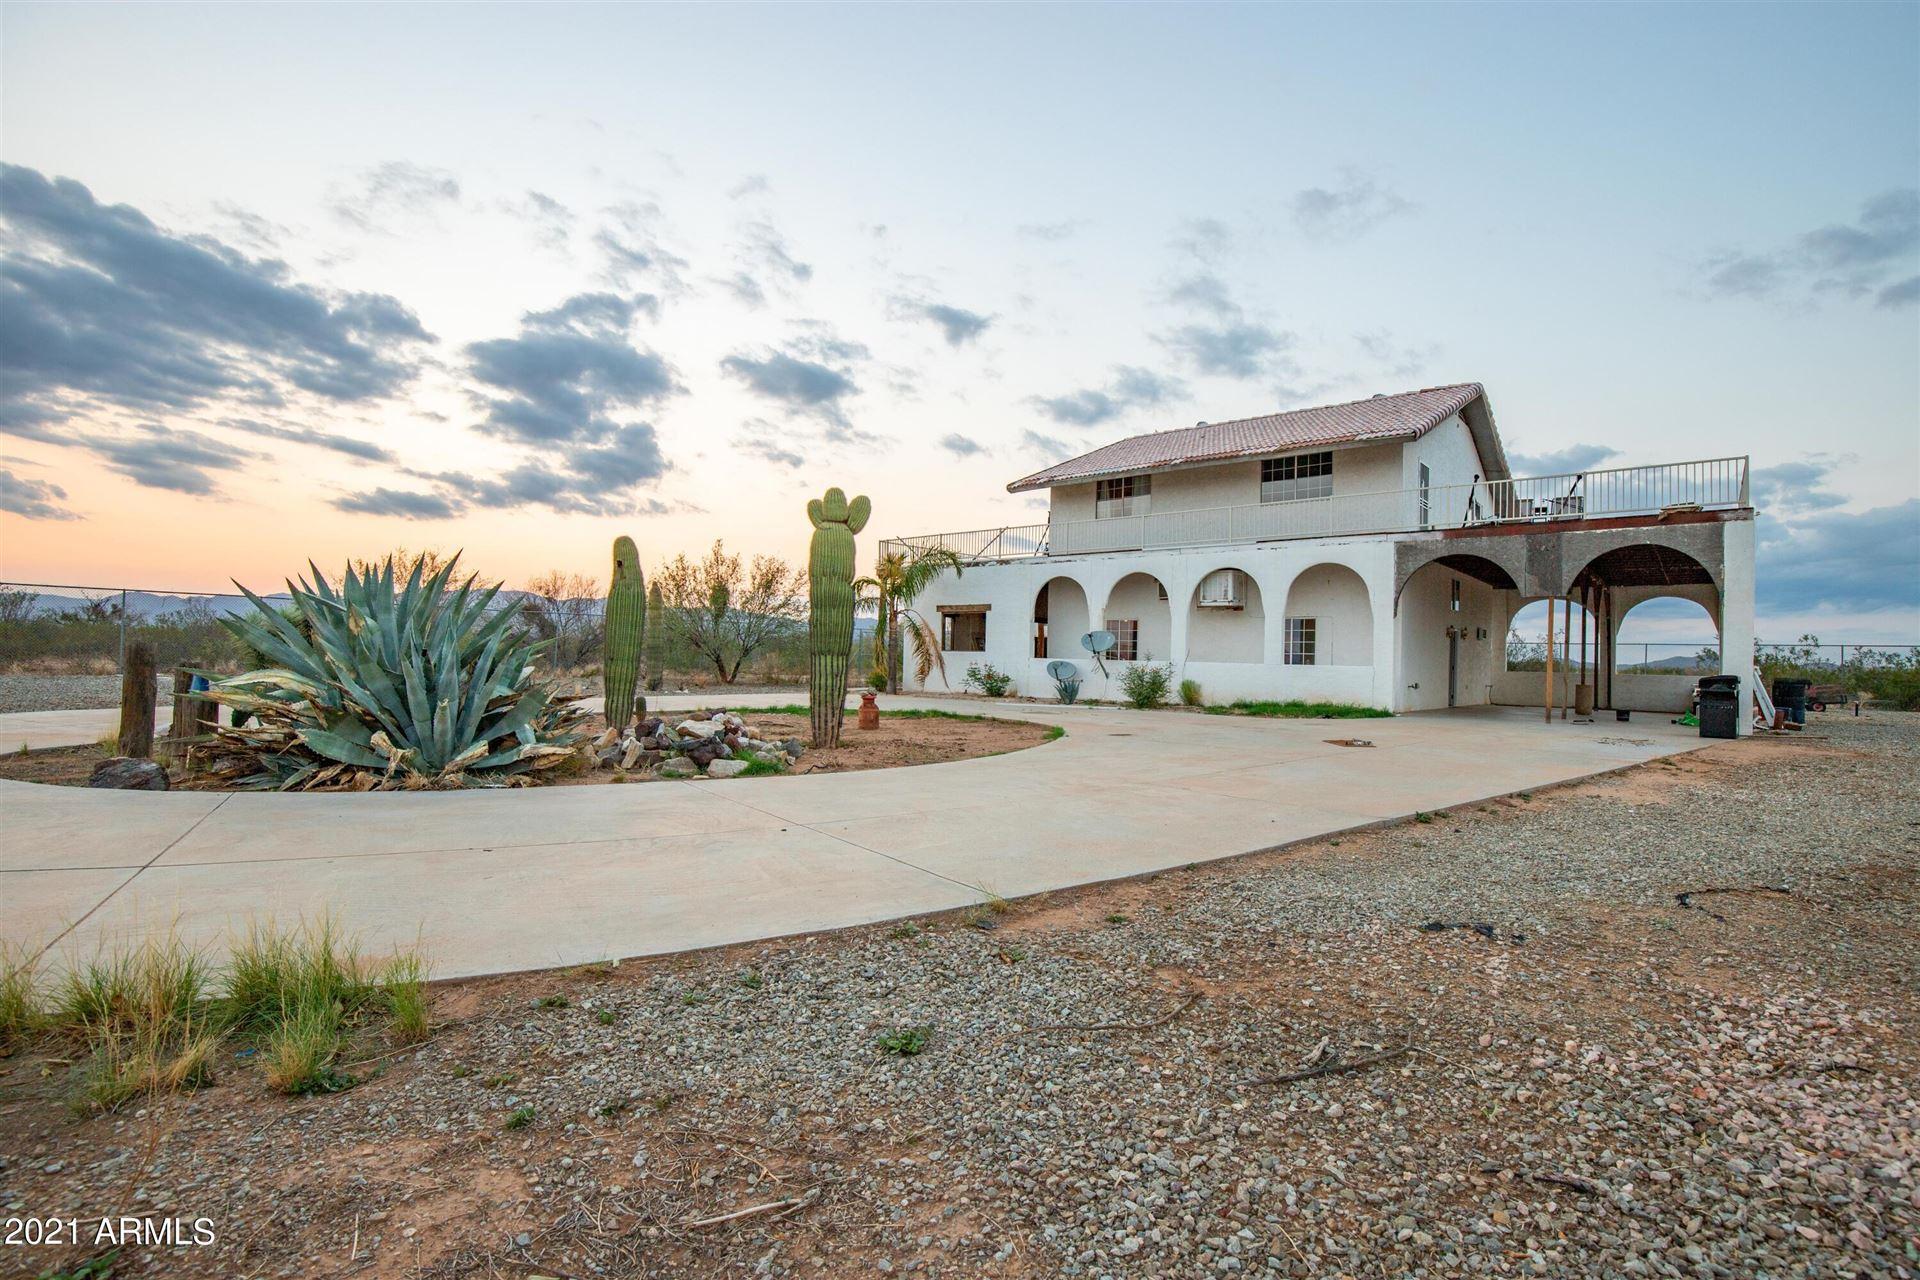 Photo of 42690 W SMITH PEAK VIEW Road, Aguila, AZ 85320 (MLS # 6281793)